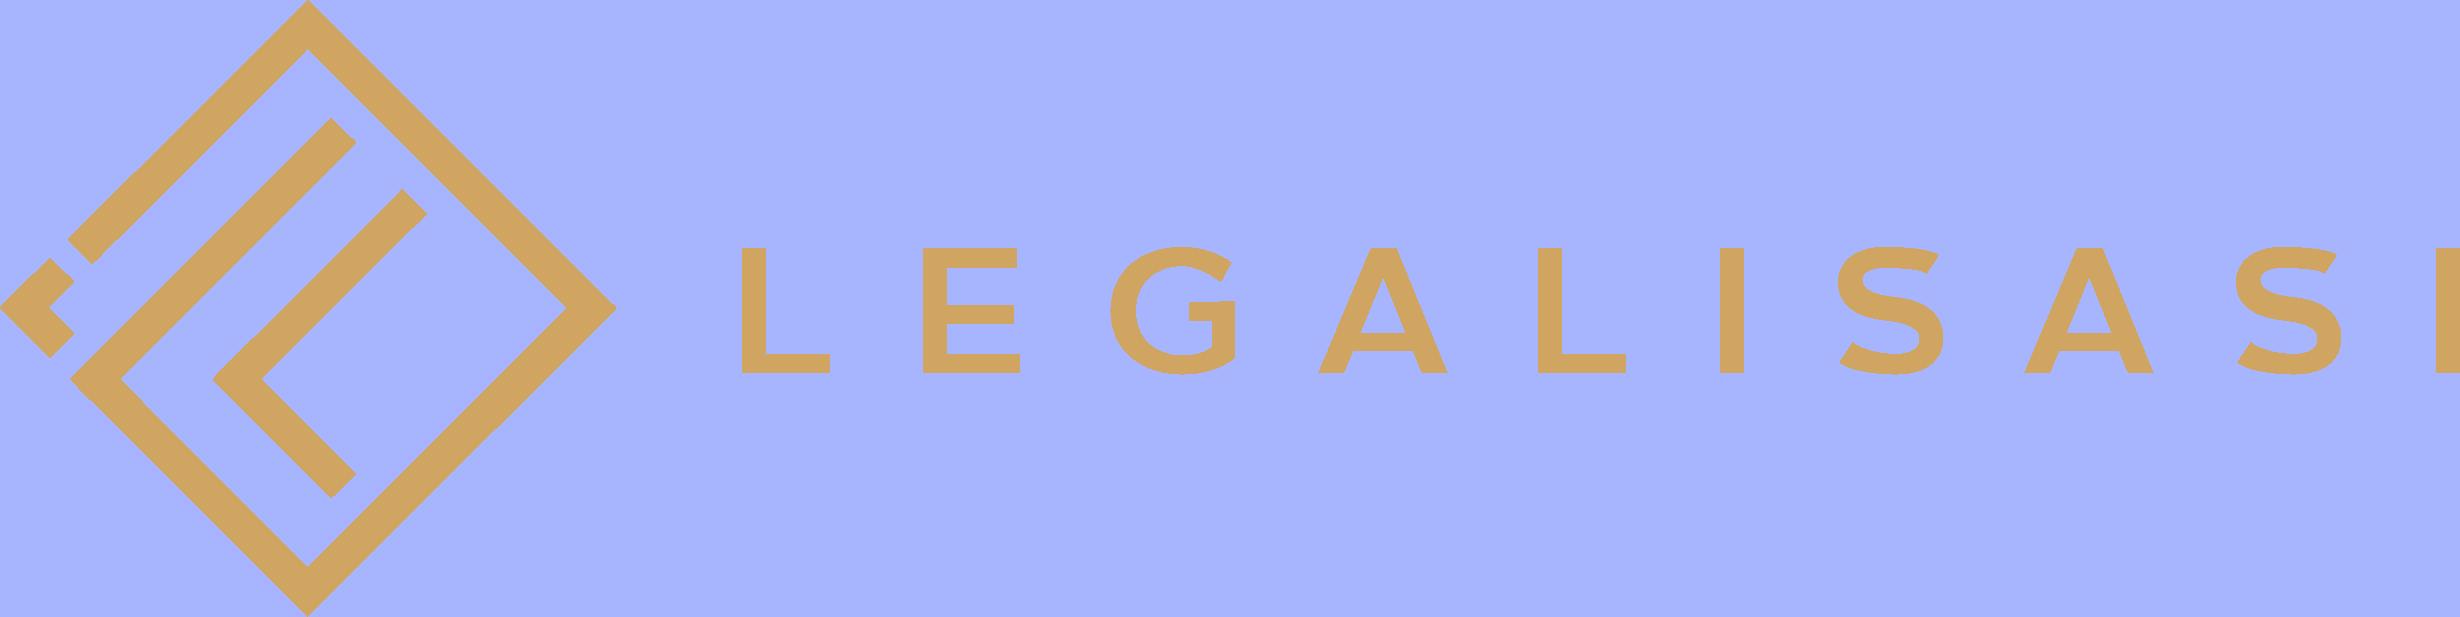 legalisasi-logo transparant